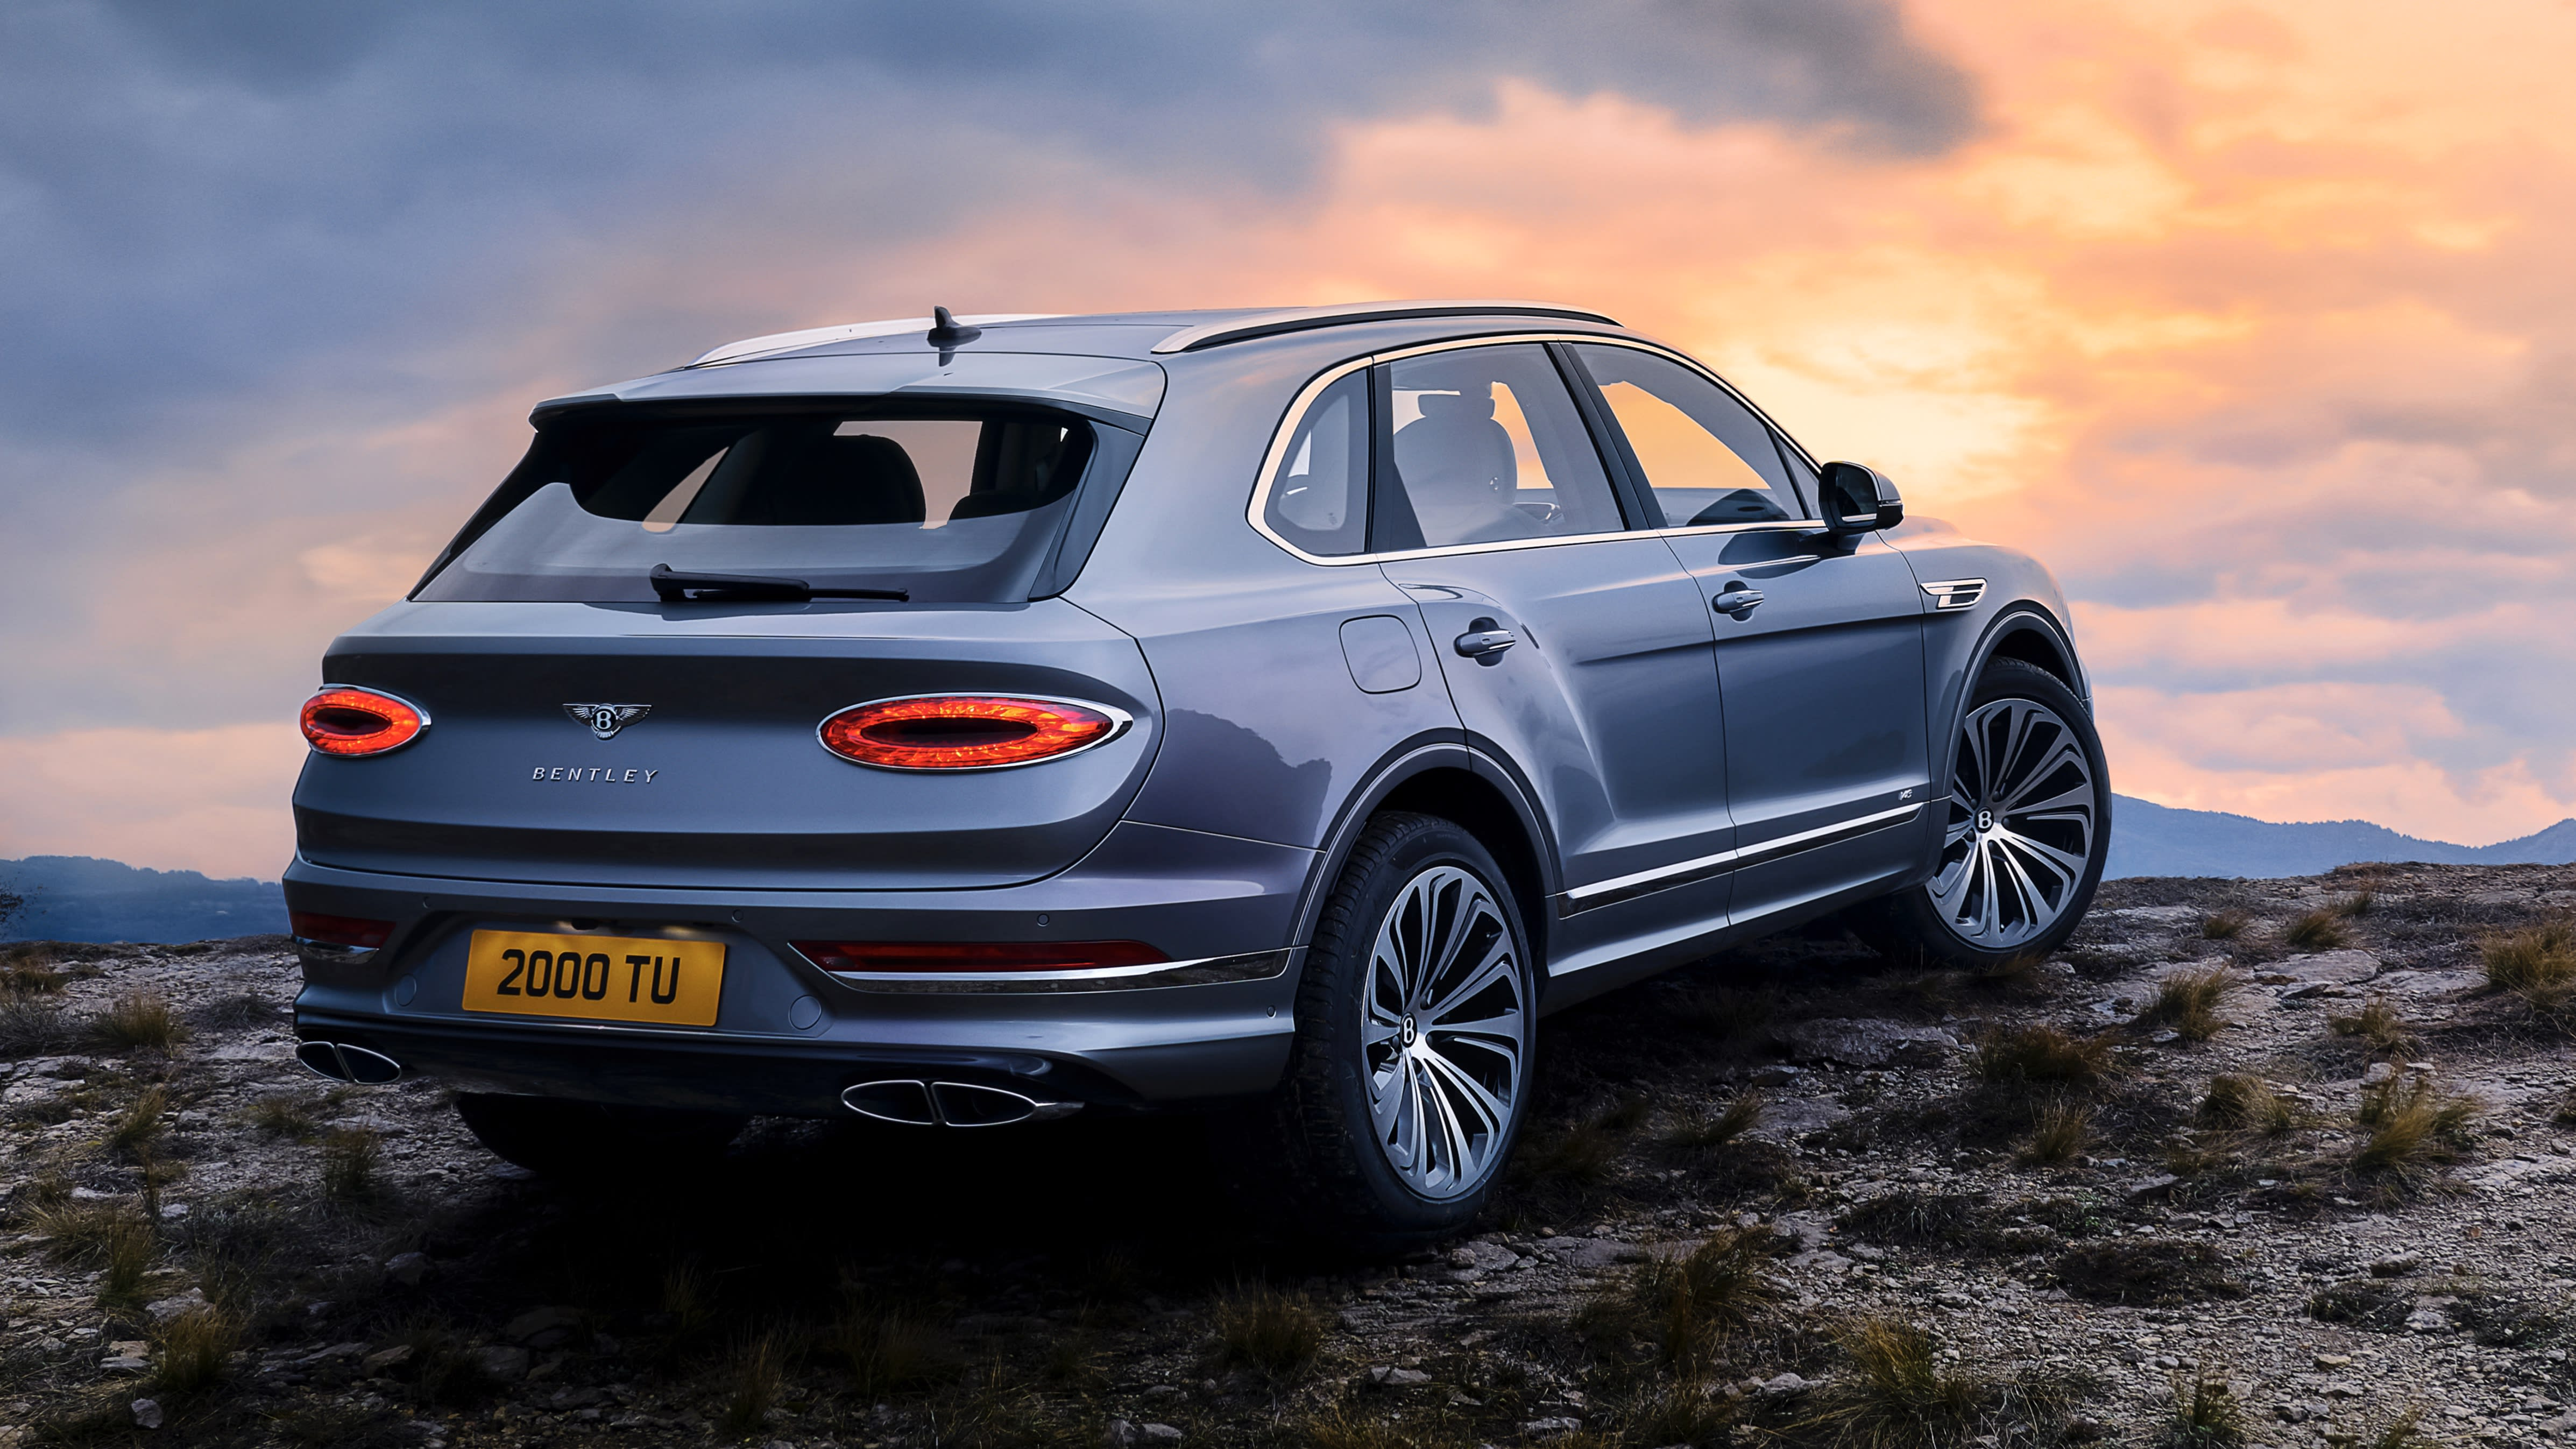 2021 Bentley Bentayga Revealed Plug In Hybrid Inbound Caradvice